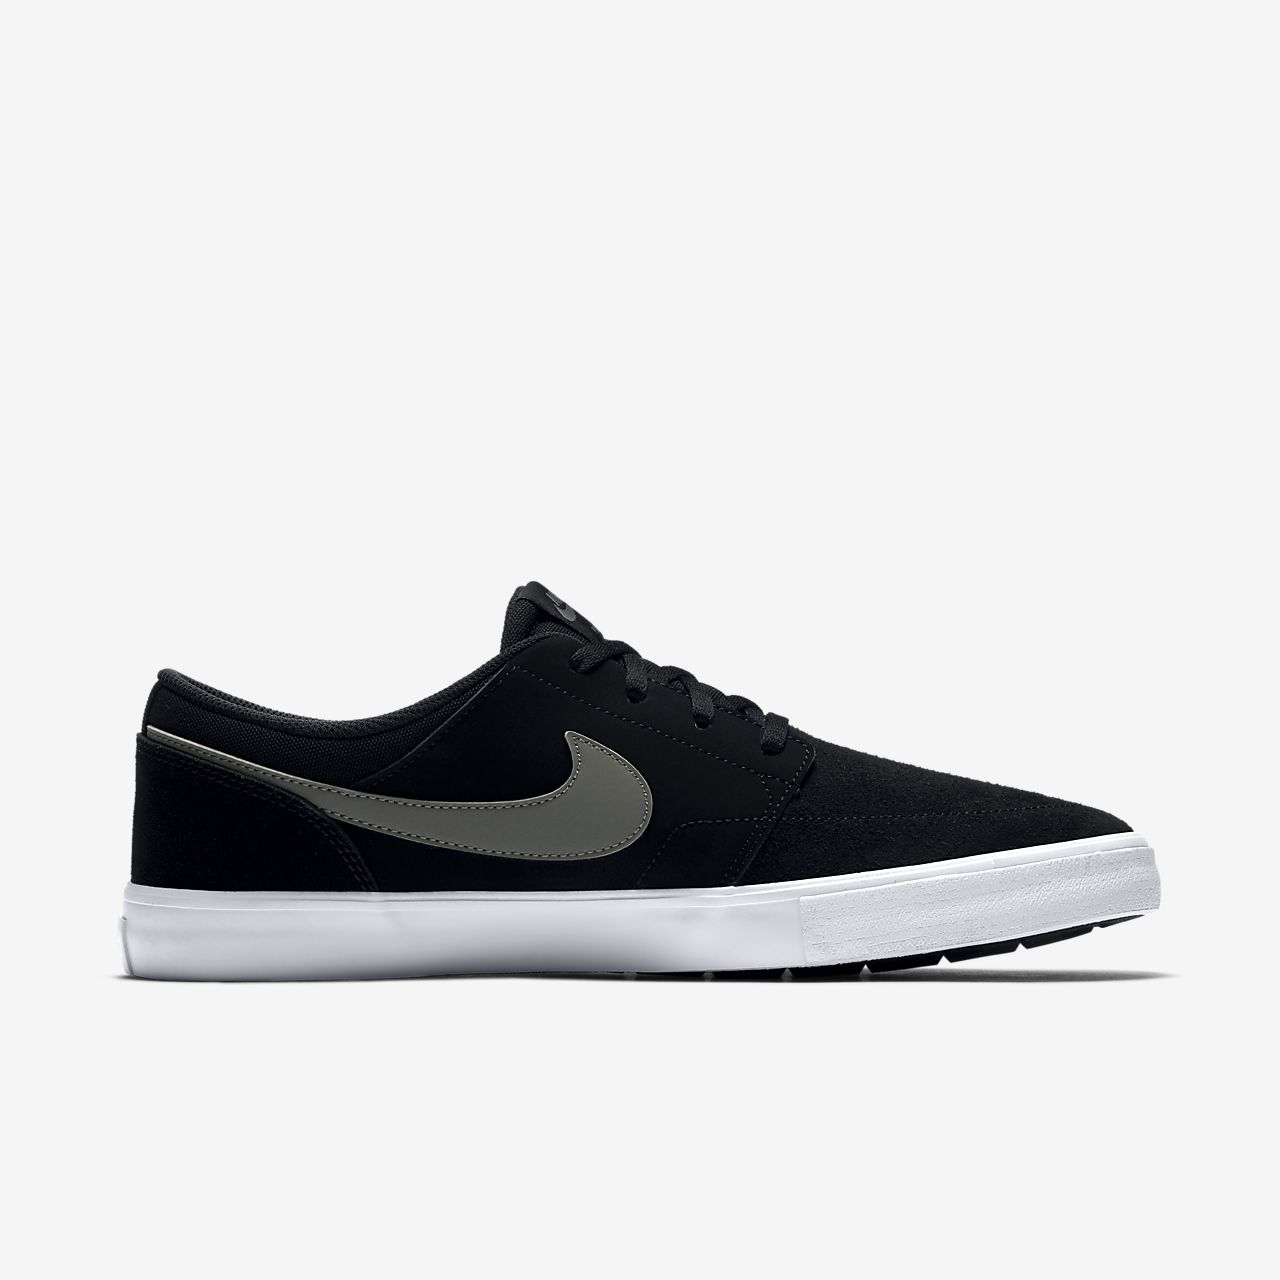 Nike SB Portmore Ii Sneaker Low Herren Schwarz Schuhe Shop